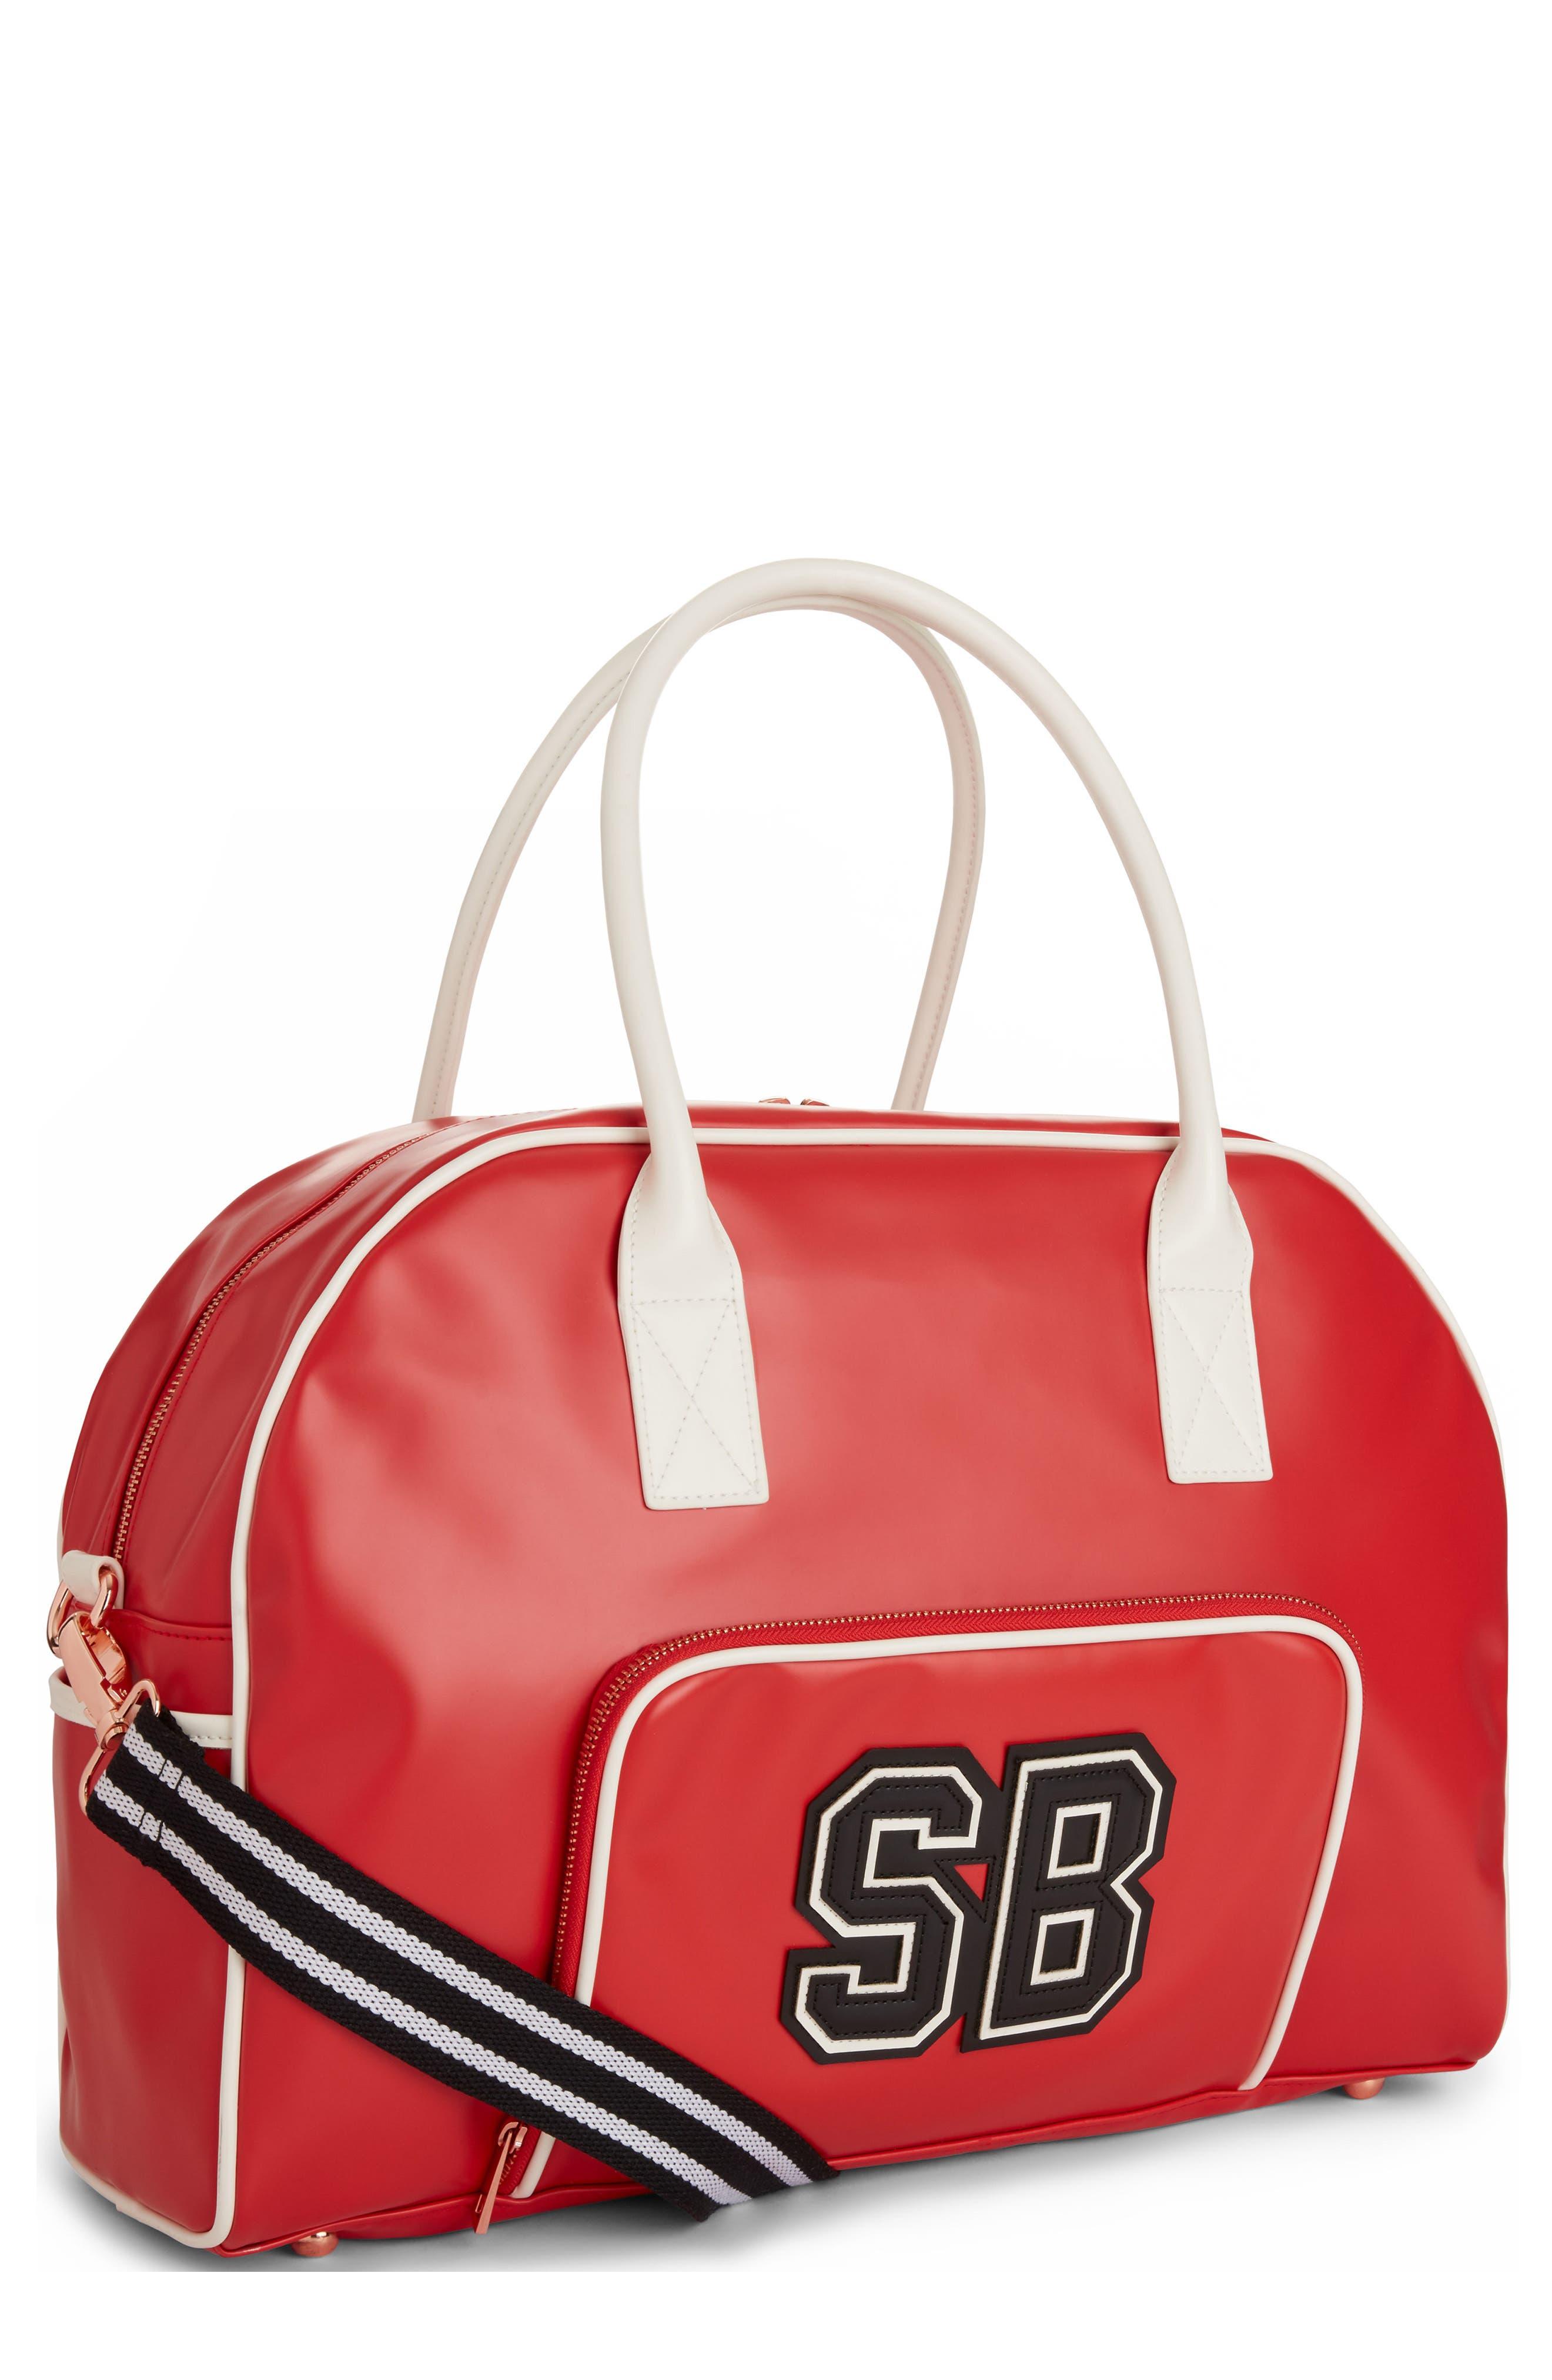 Bowler Bag,                             Main thumbnail 1, color,                             Scarlet Red